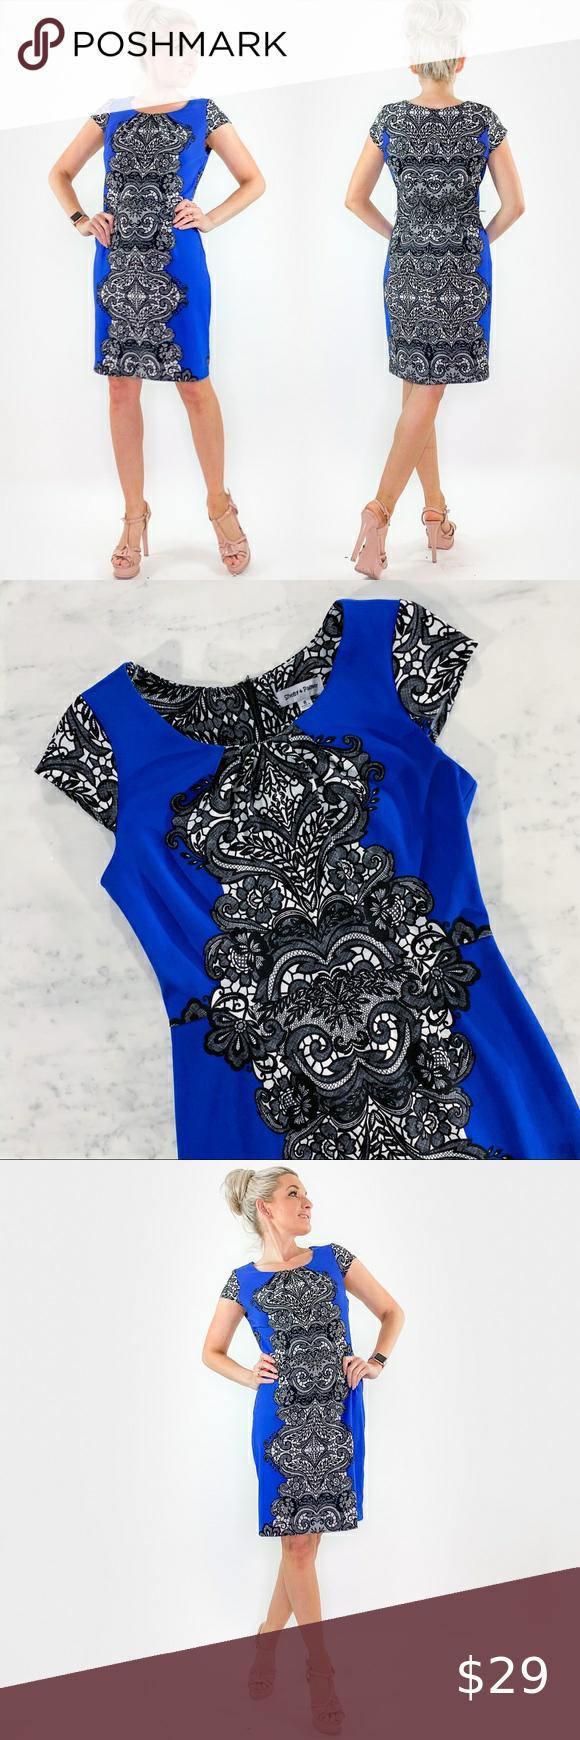 Blue Dress By Shelby And Palmer Dress Size Chart Women Shelby Palmer Blue Dresses